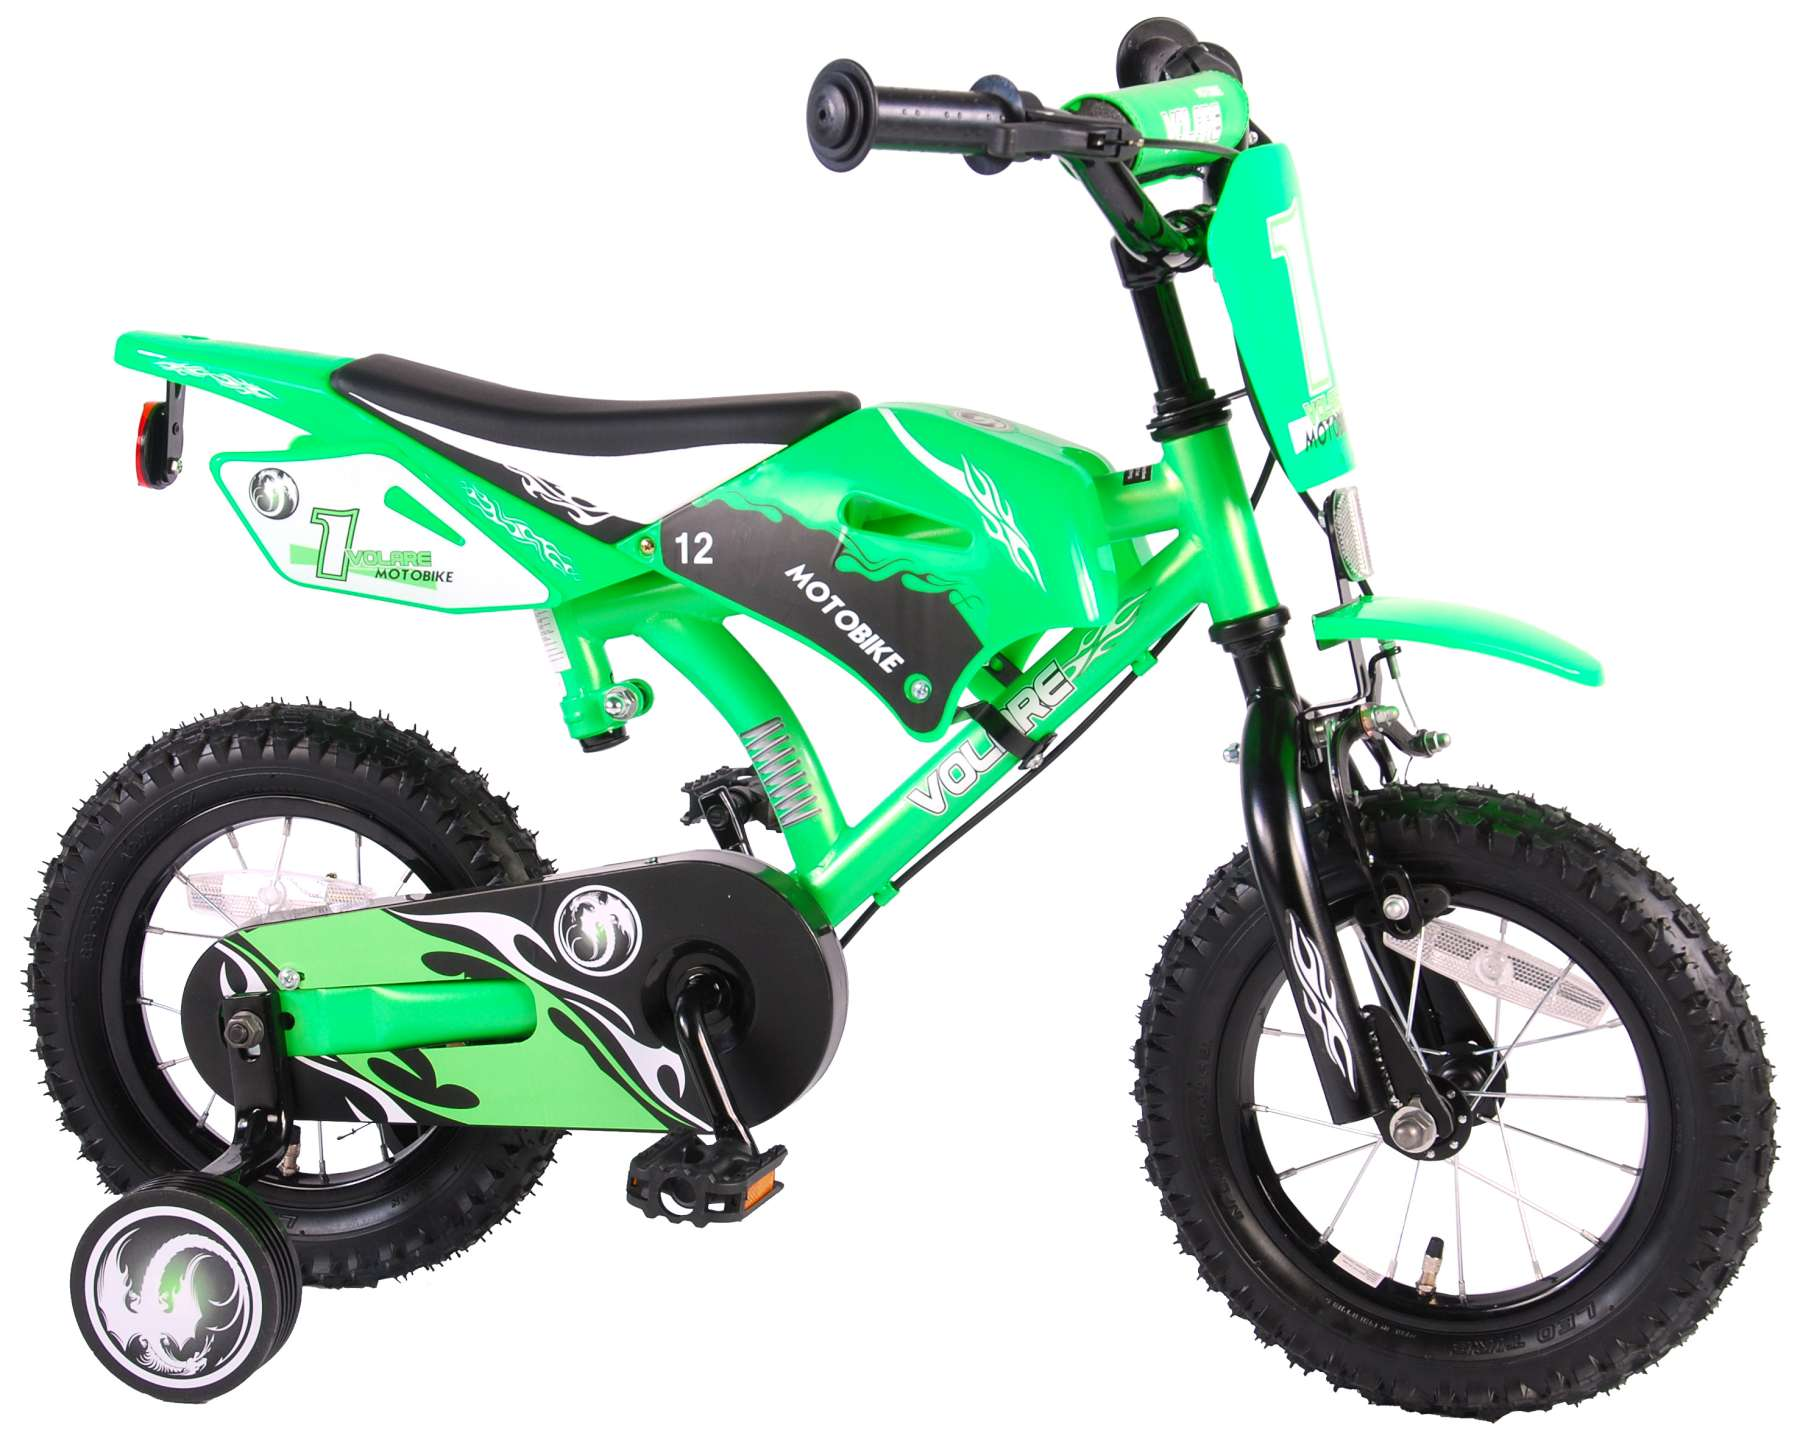 Bicicleta Motorbike de 12 pulgadas Verde